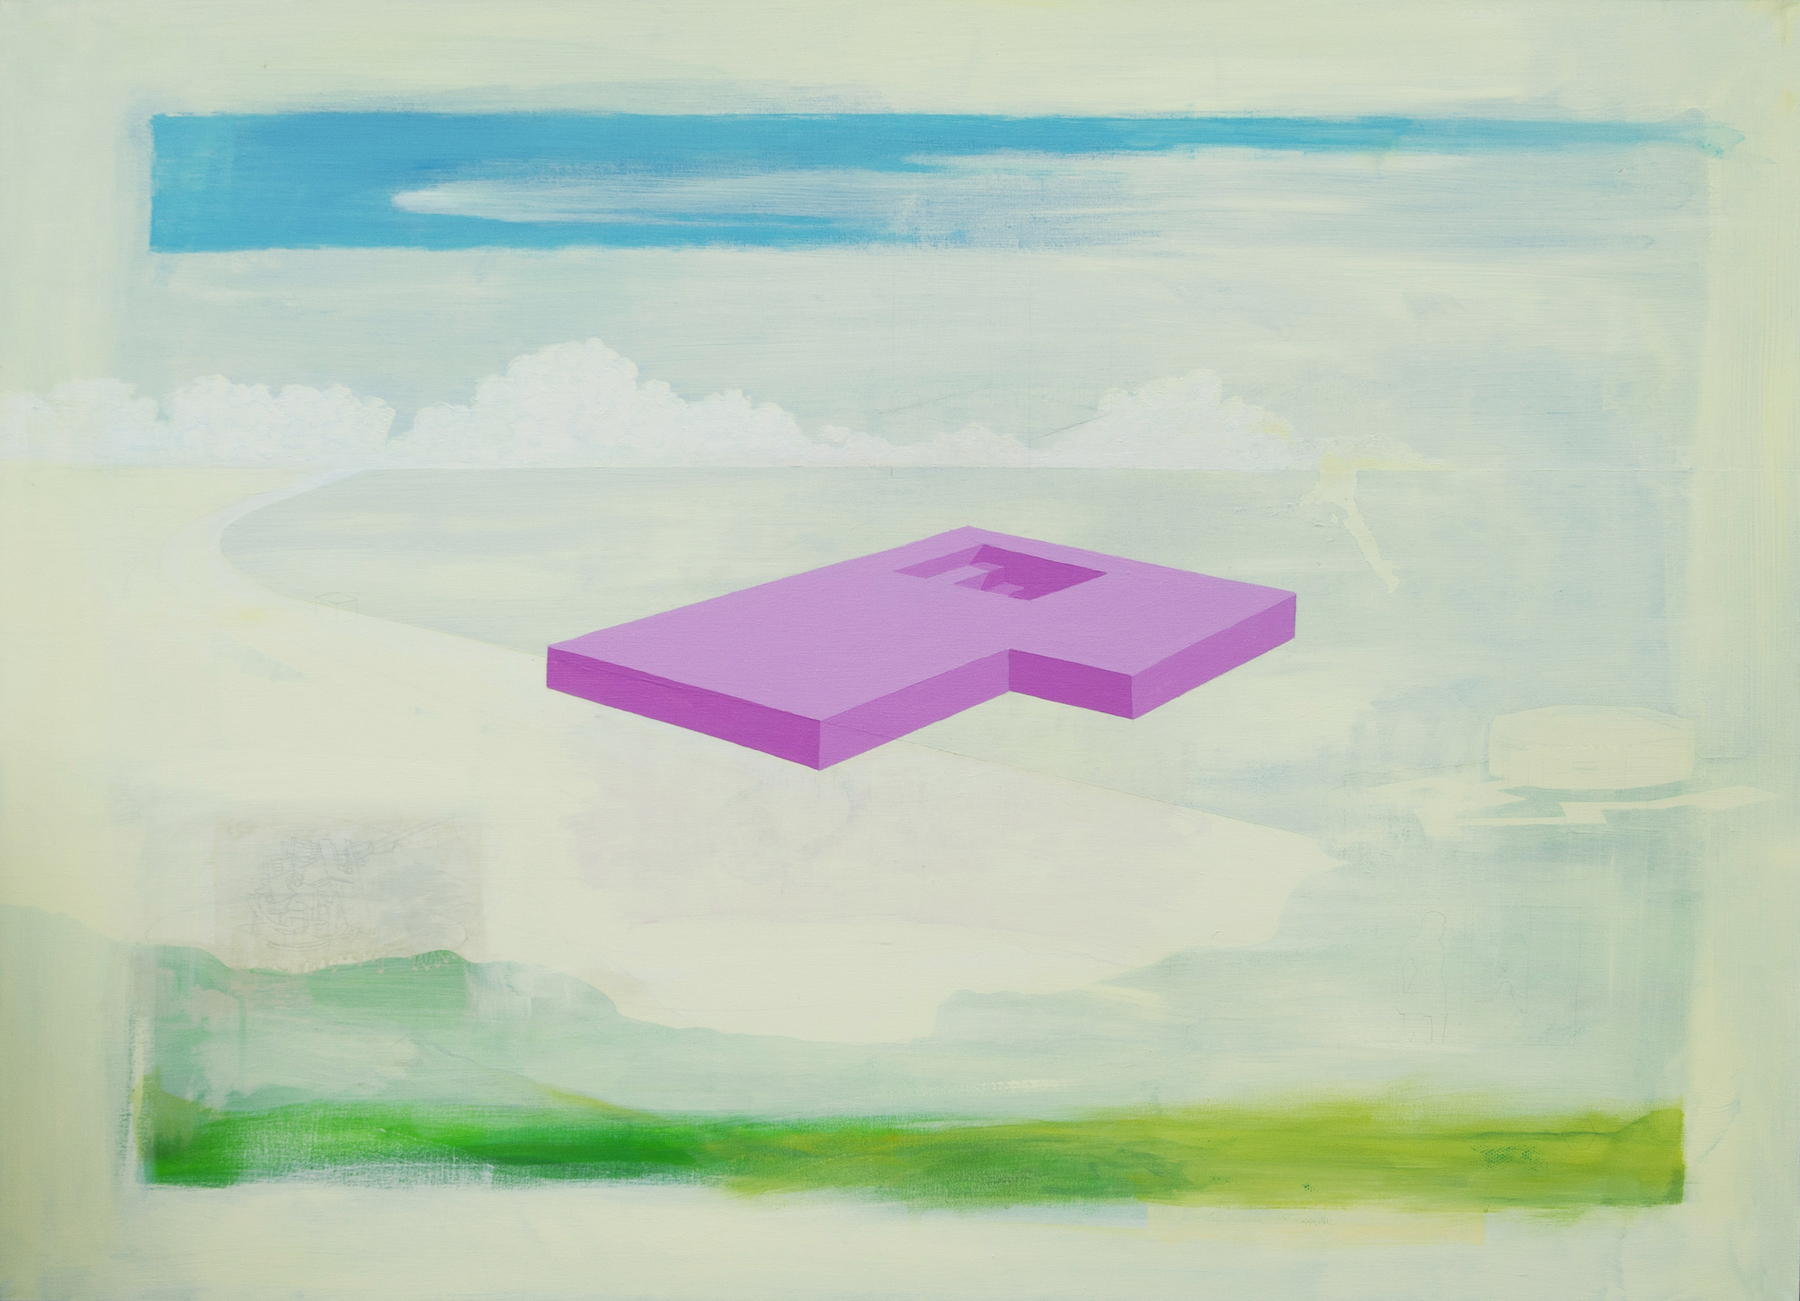 Gary Scholes, 'Component', Acrylic on canvas, 92 x 127 x 4 cm,  https://www.garyscholes.com/